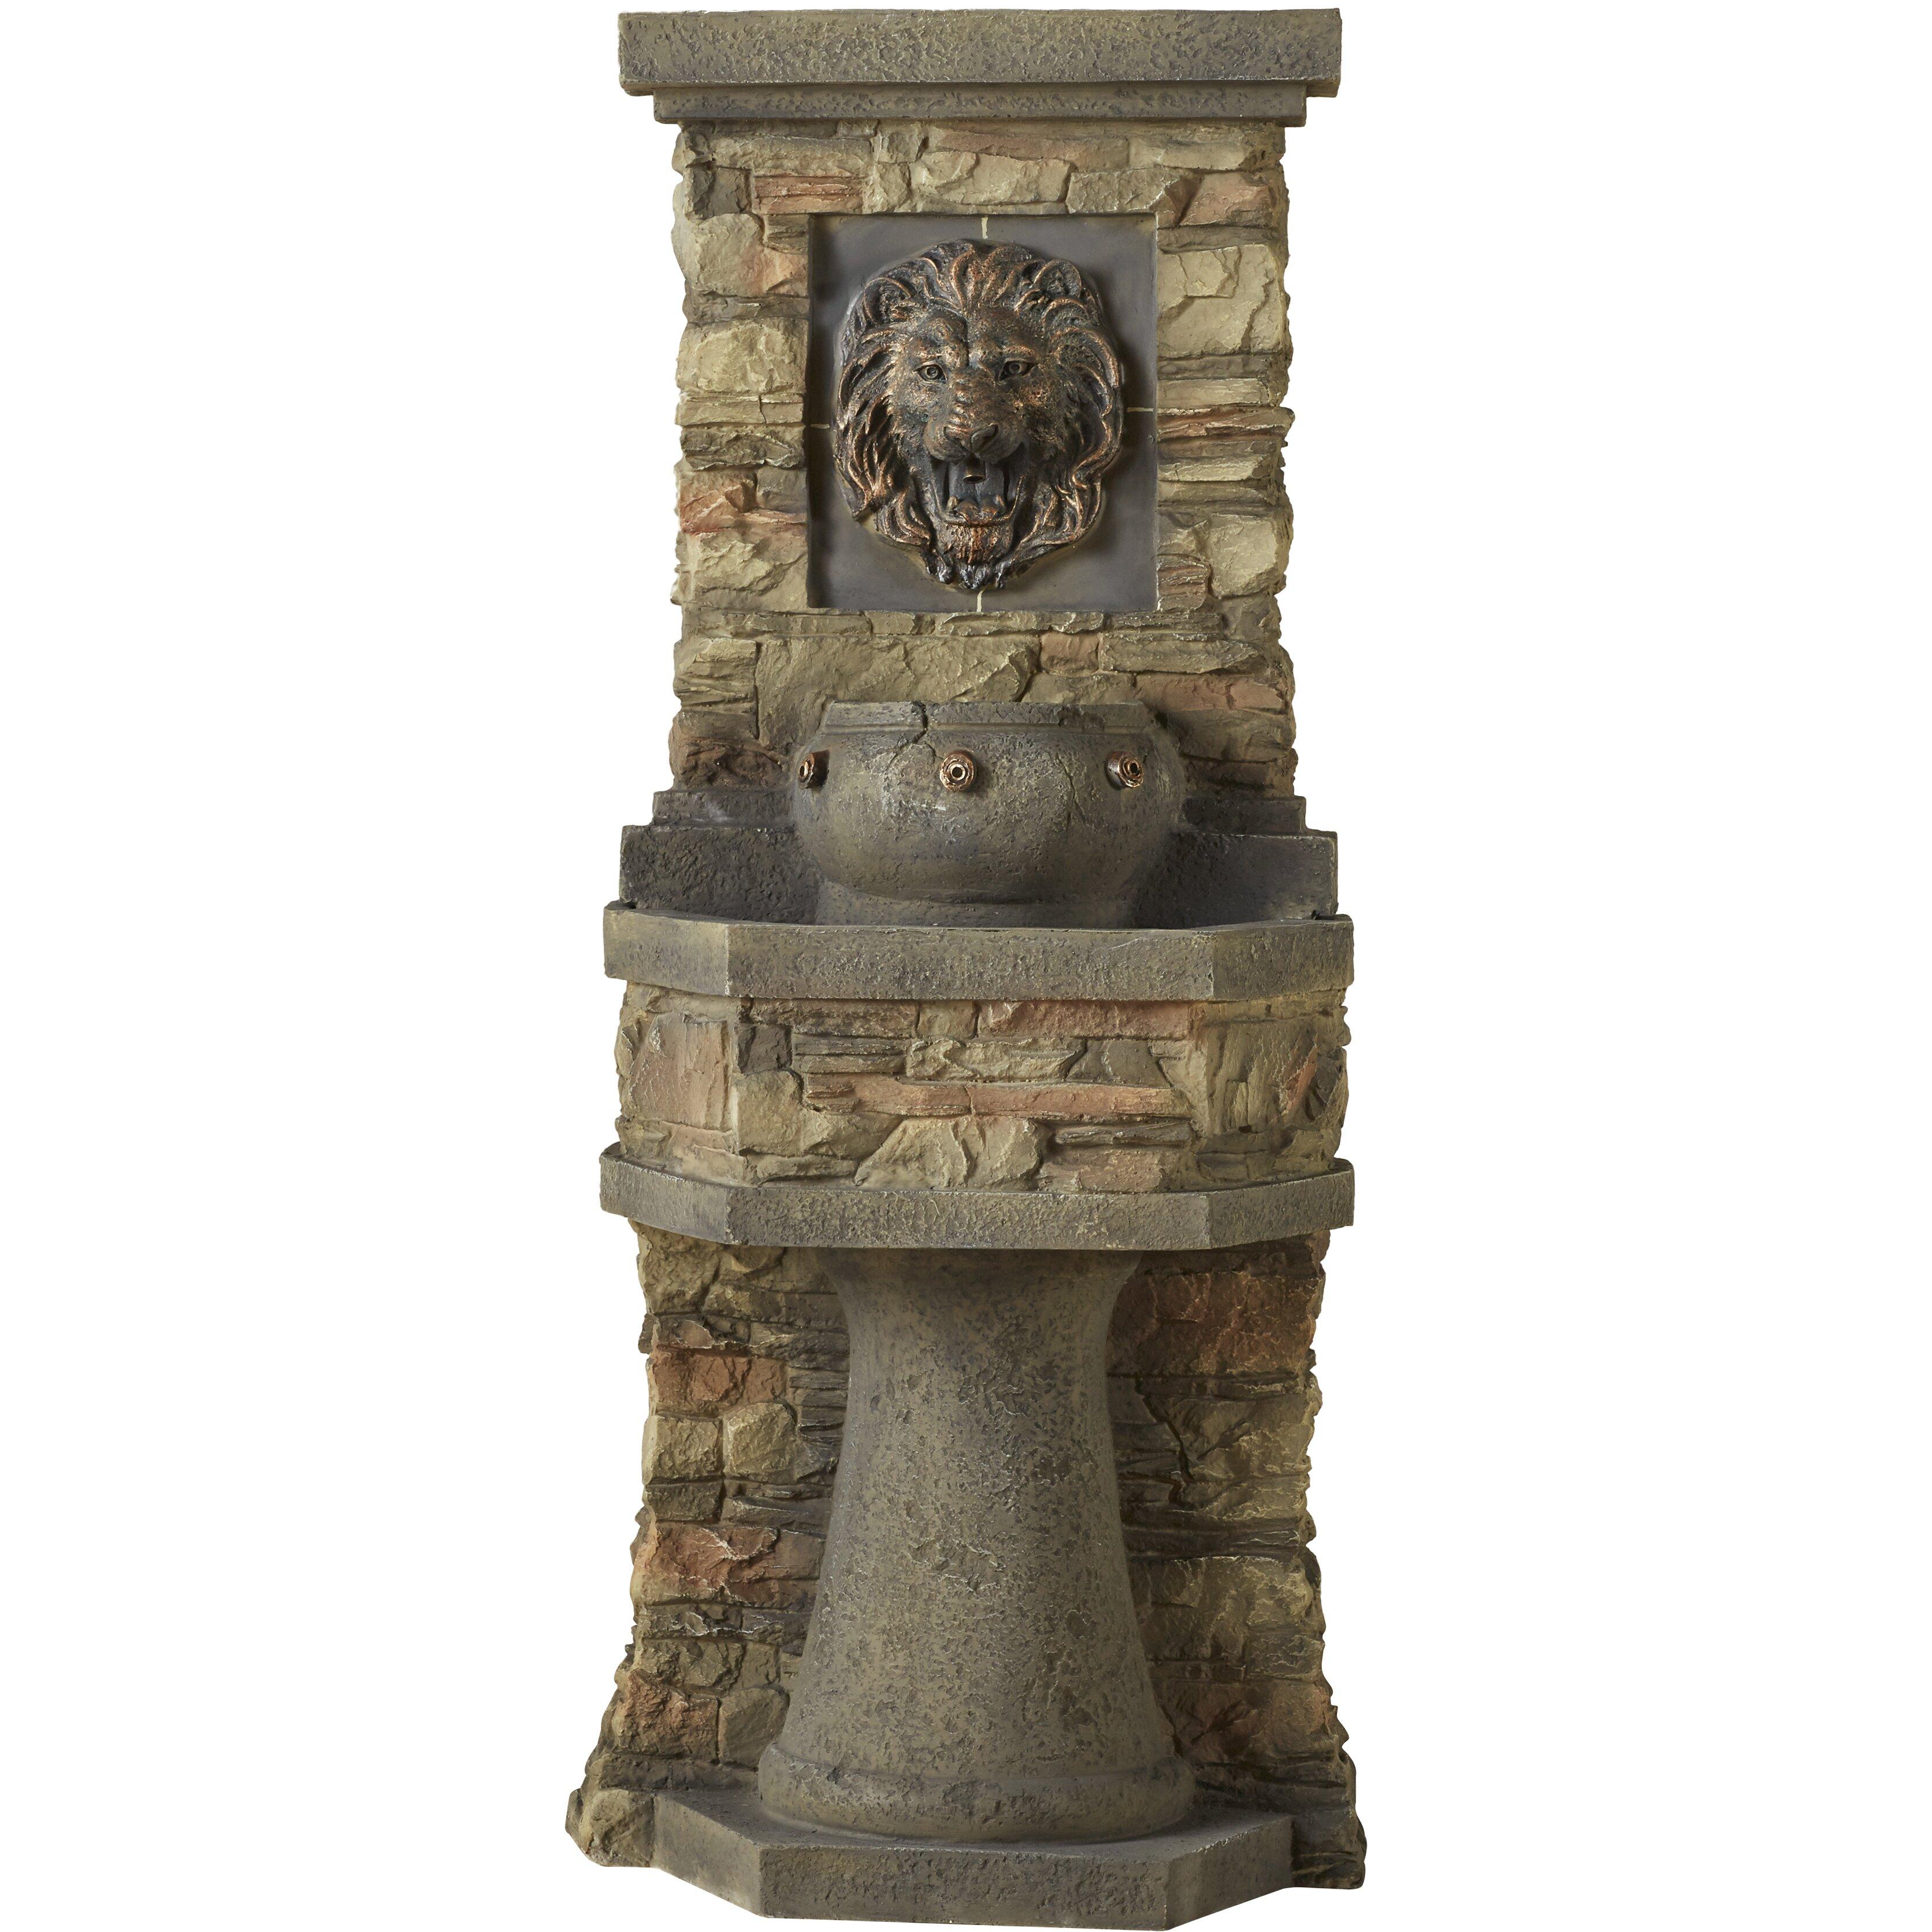 Water fountains calgary - Jeco Inc Resin Fiberglass Lion Head Outdoor Indoor Water Fountain